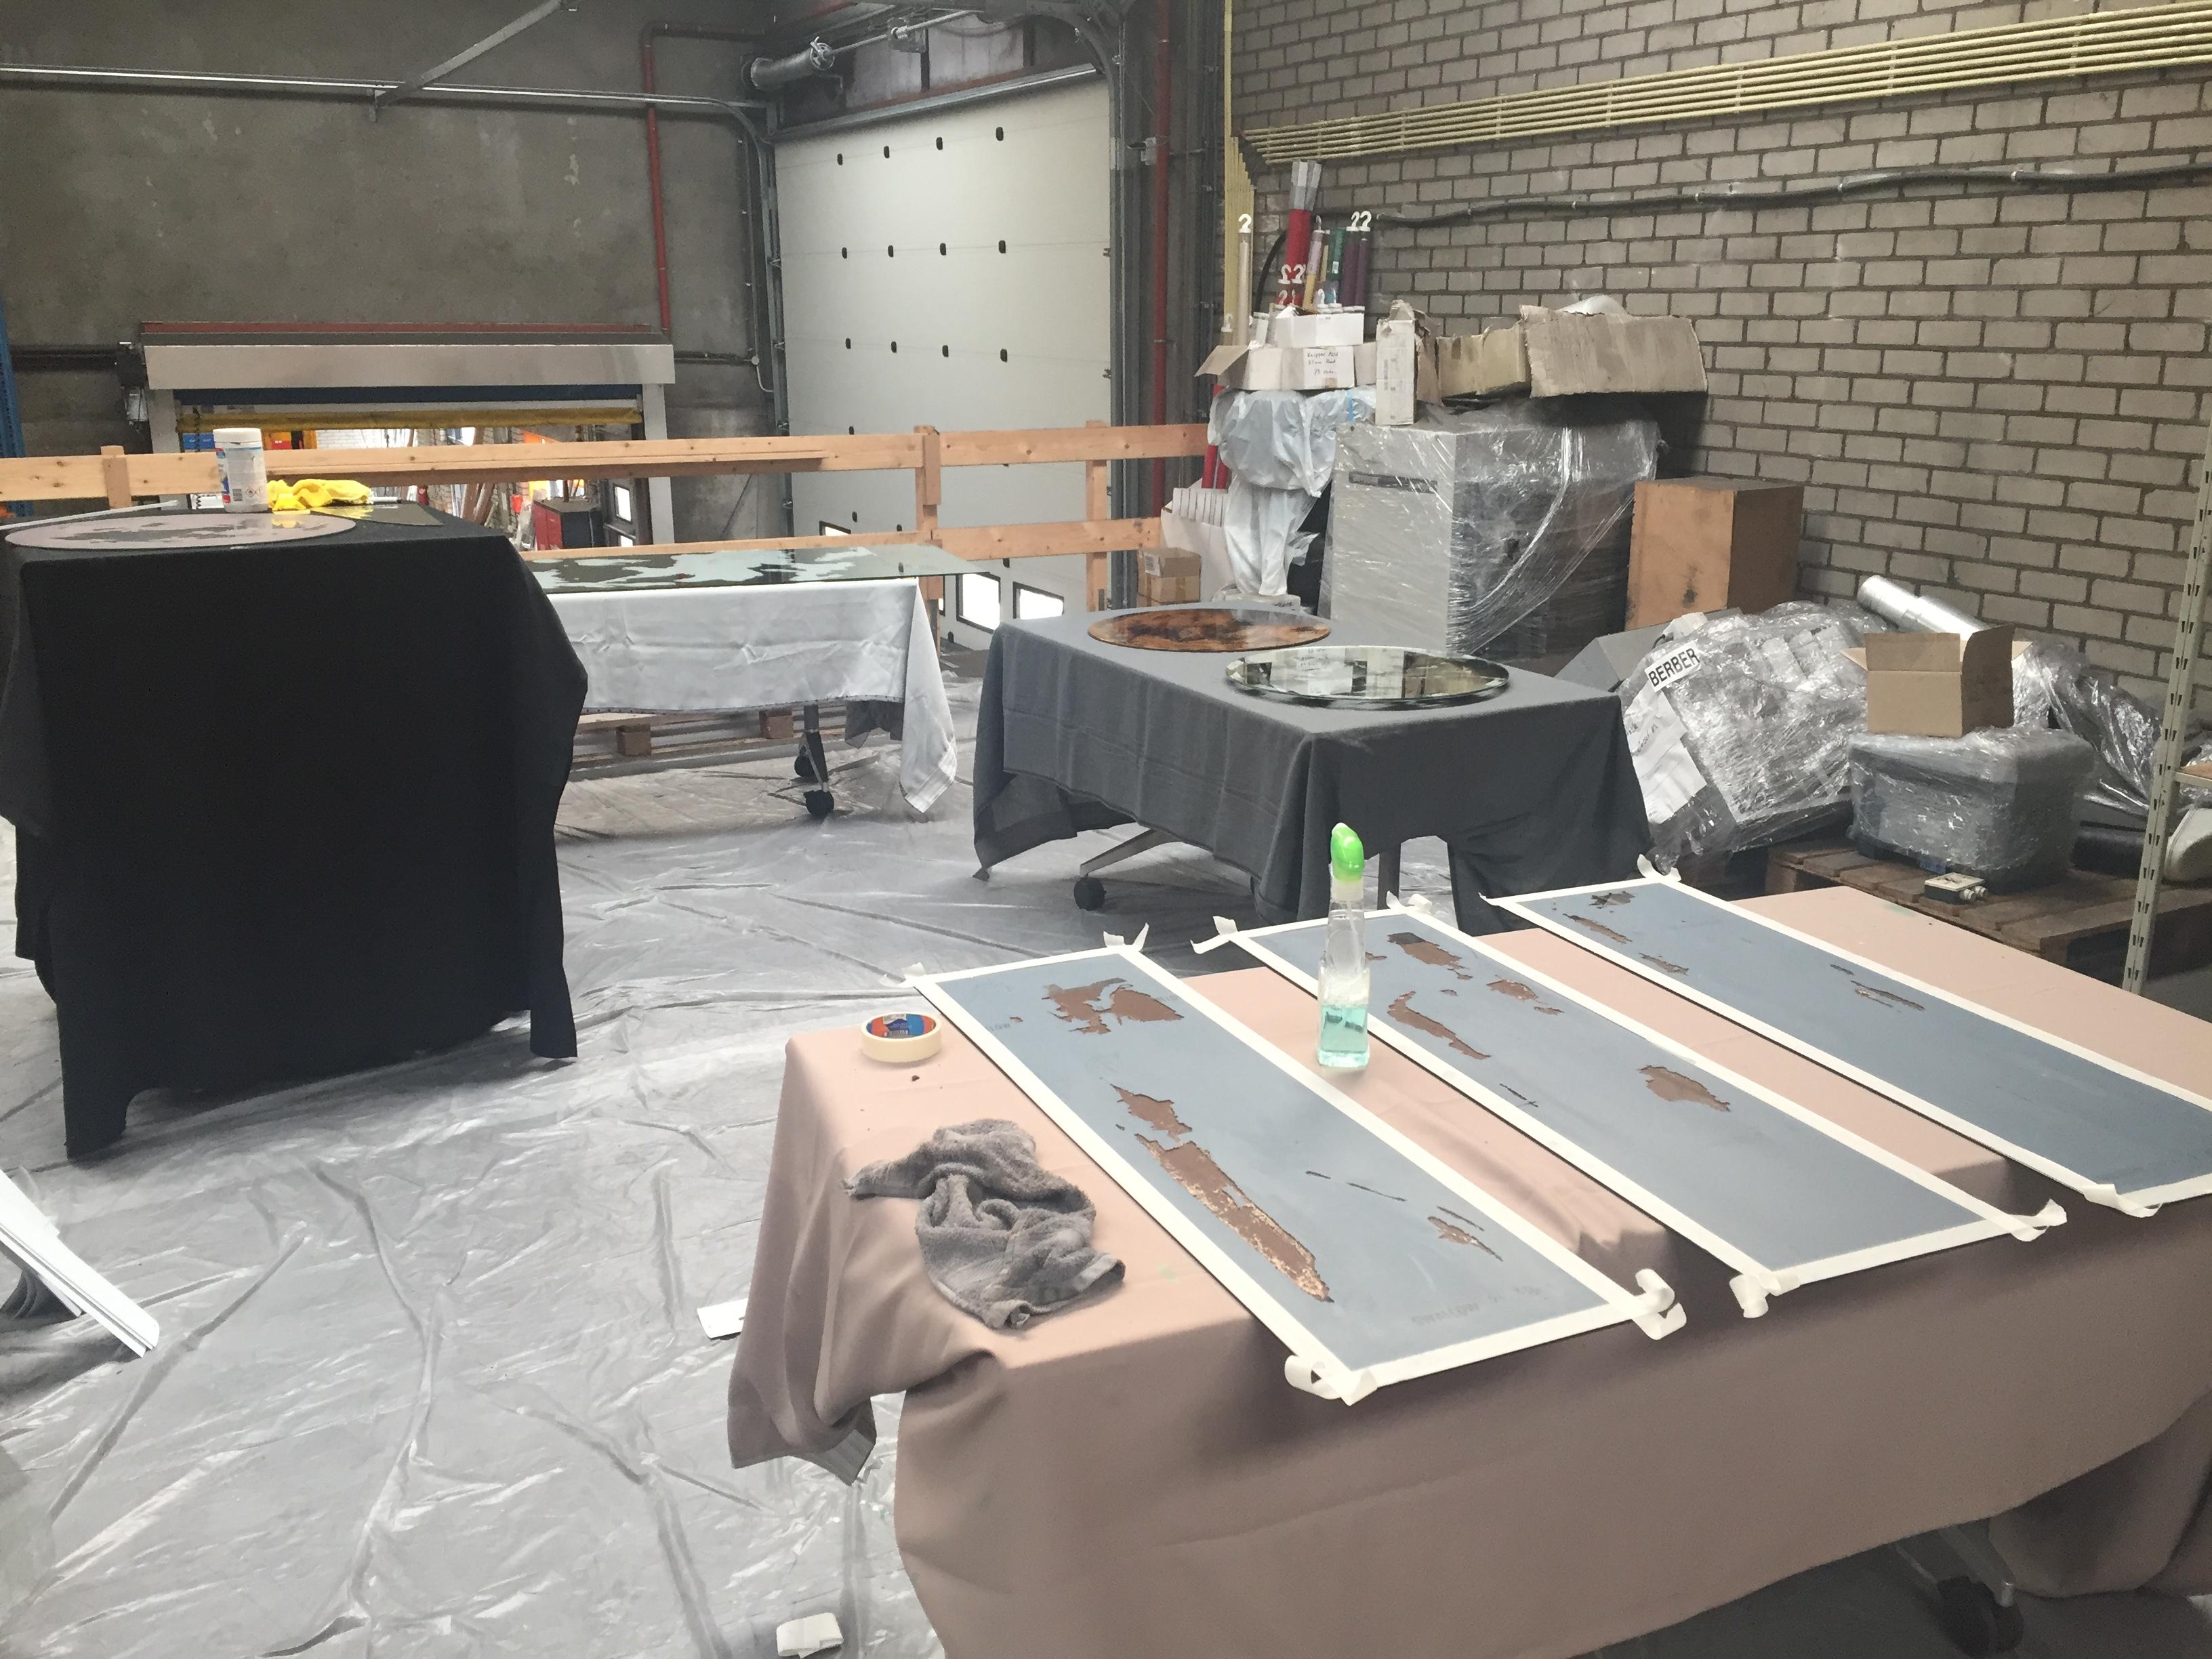 My workshop in 't Harde